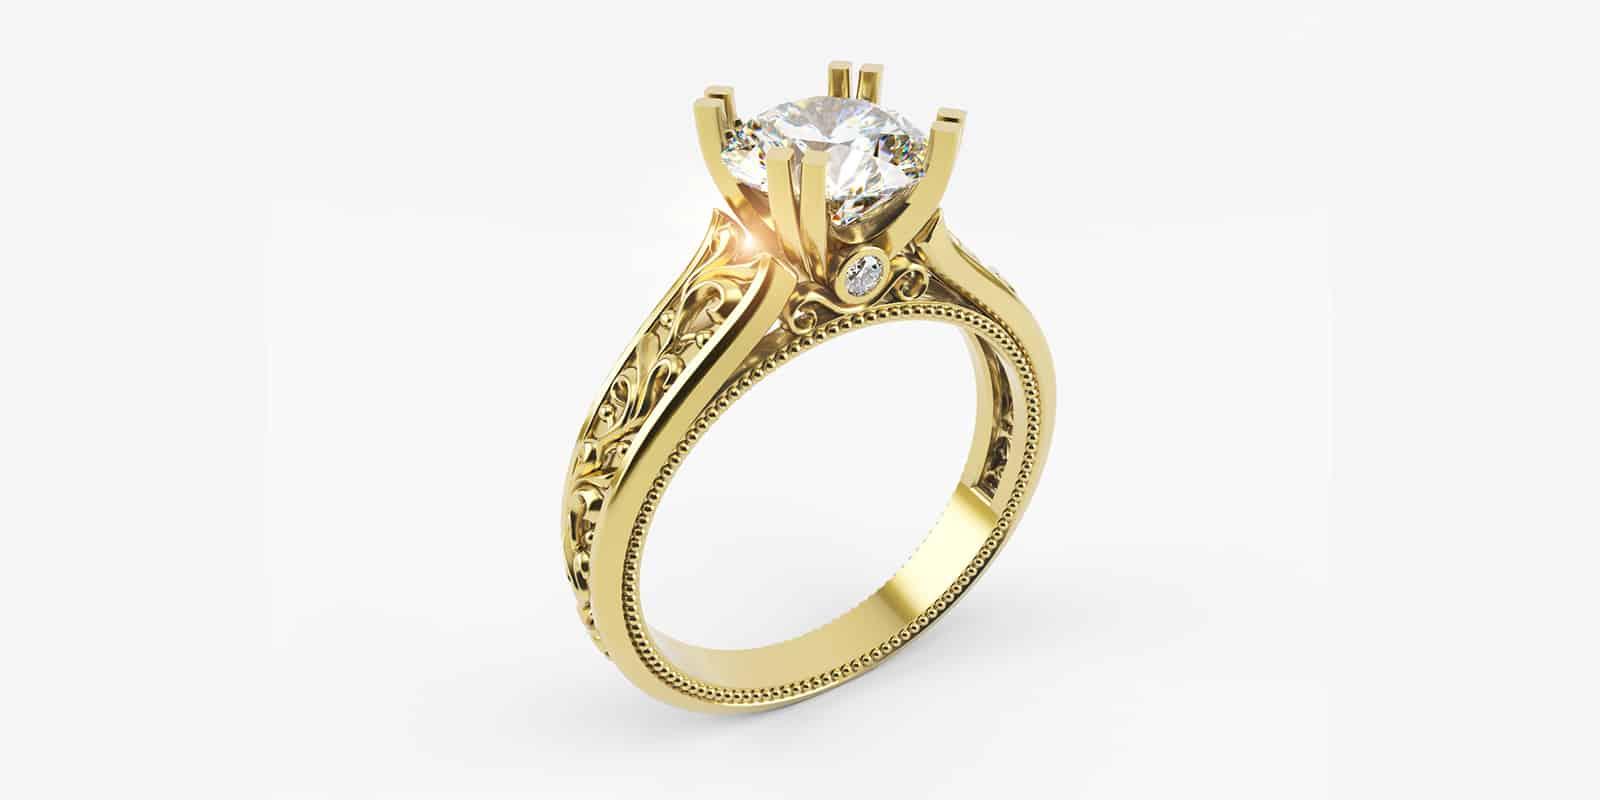 Web3D - תלת מימד - טבעת יהלום מזהב